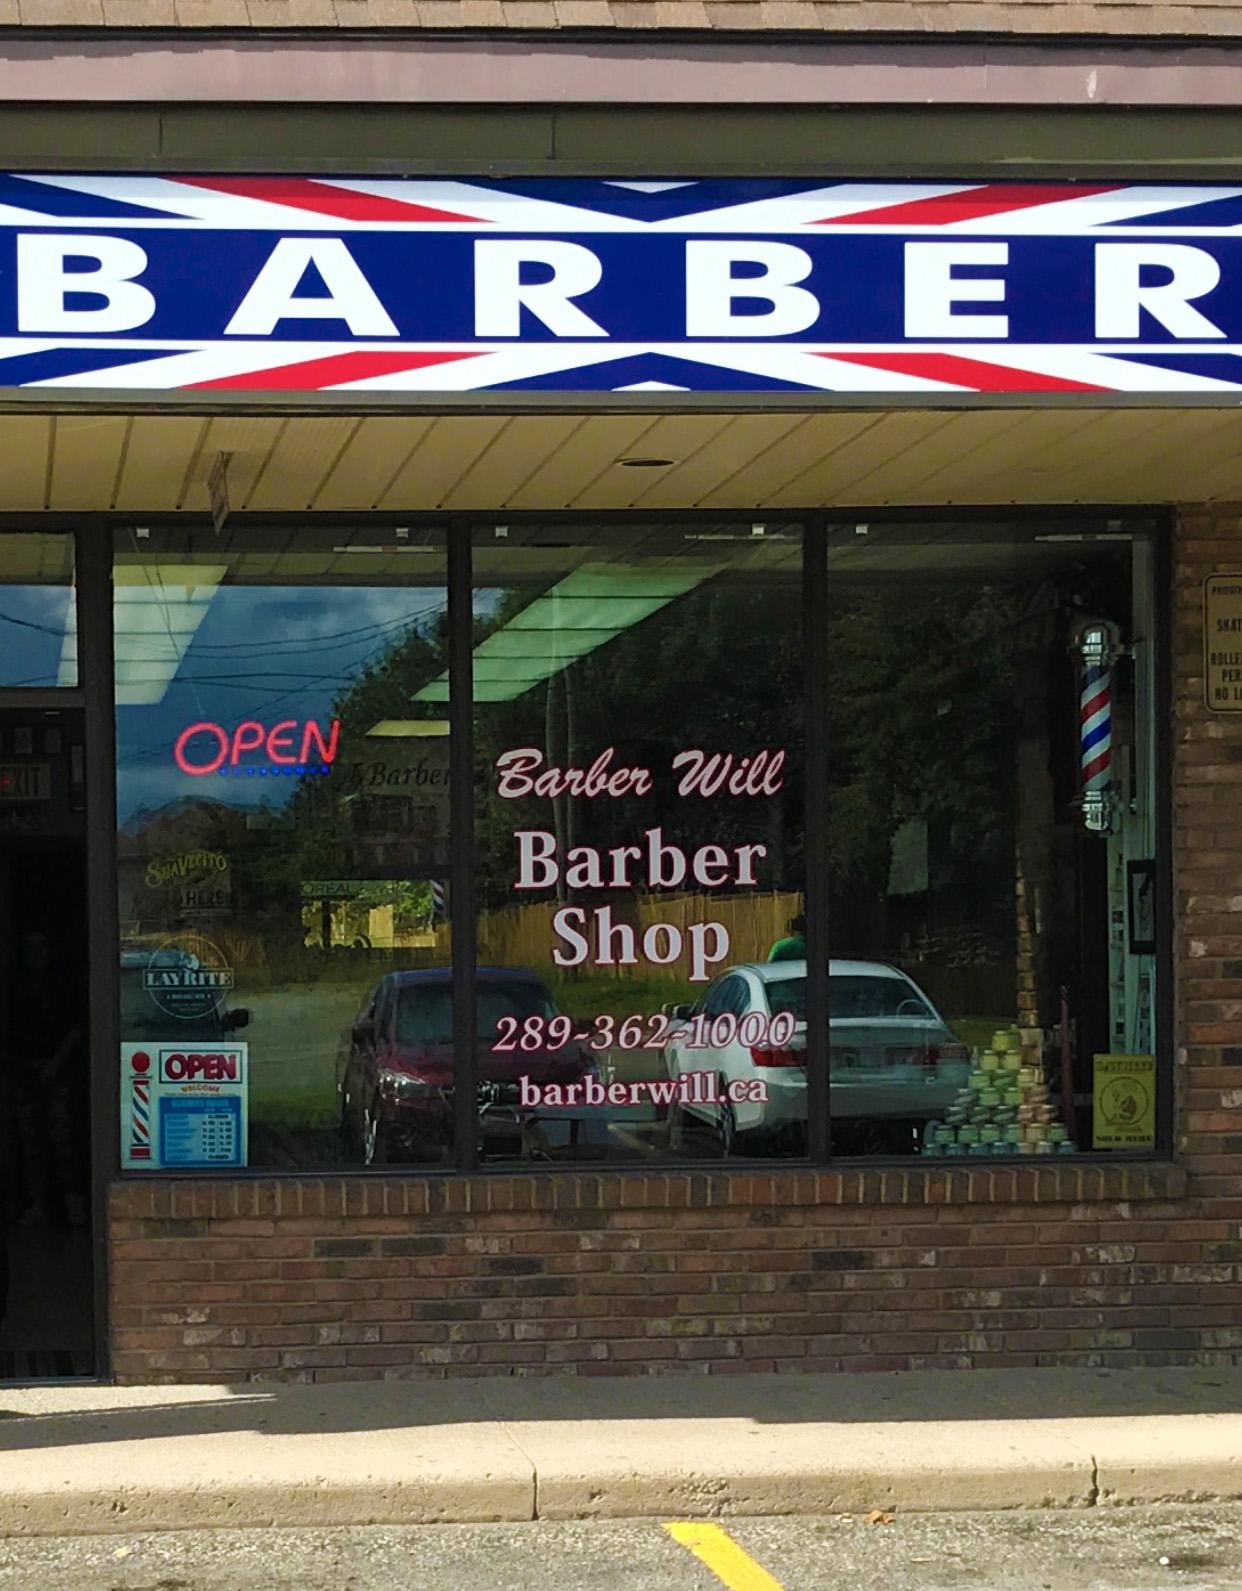 Barber Will Barber Shop - Open